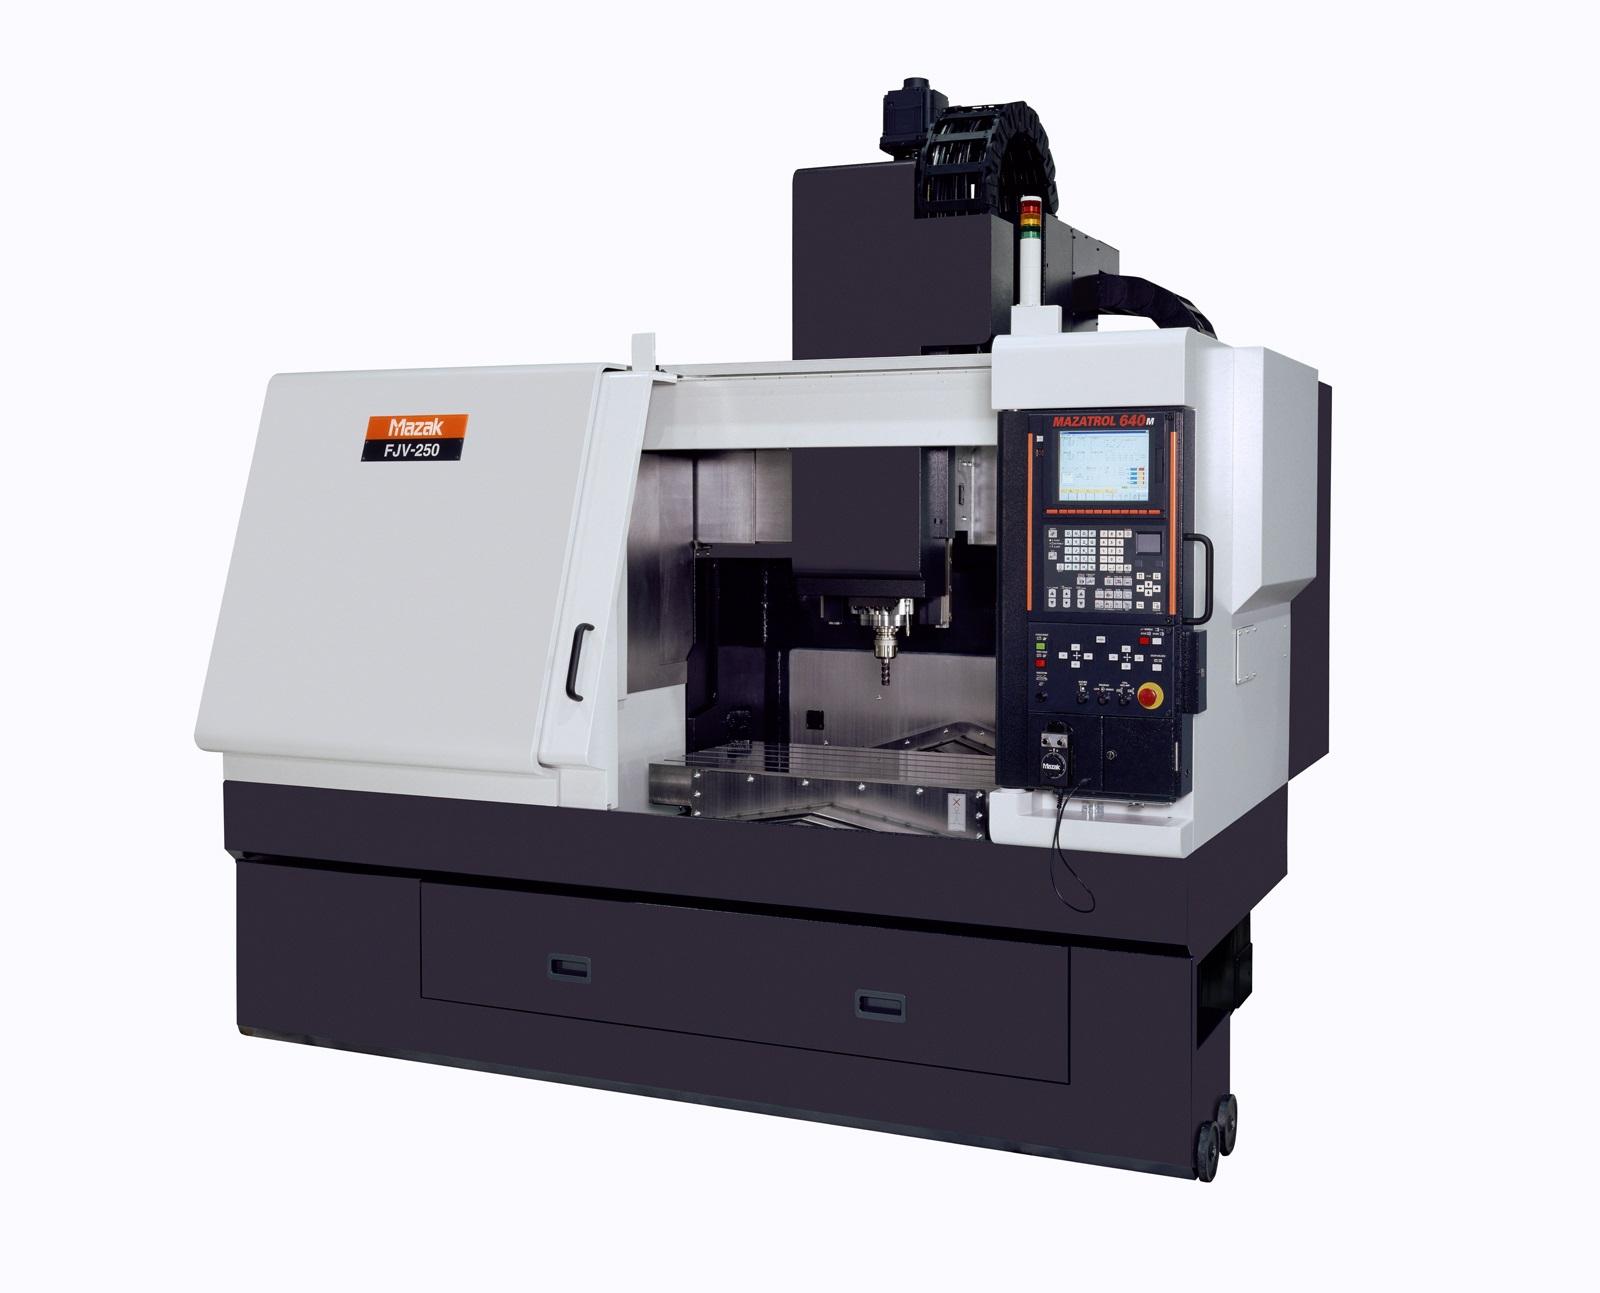 FJV-250